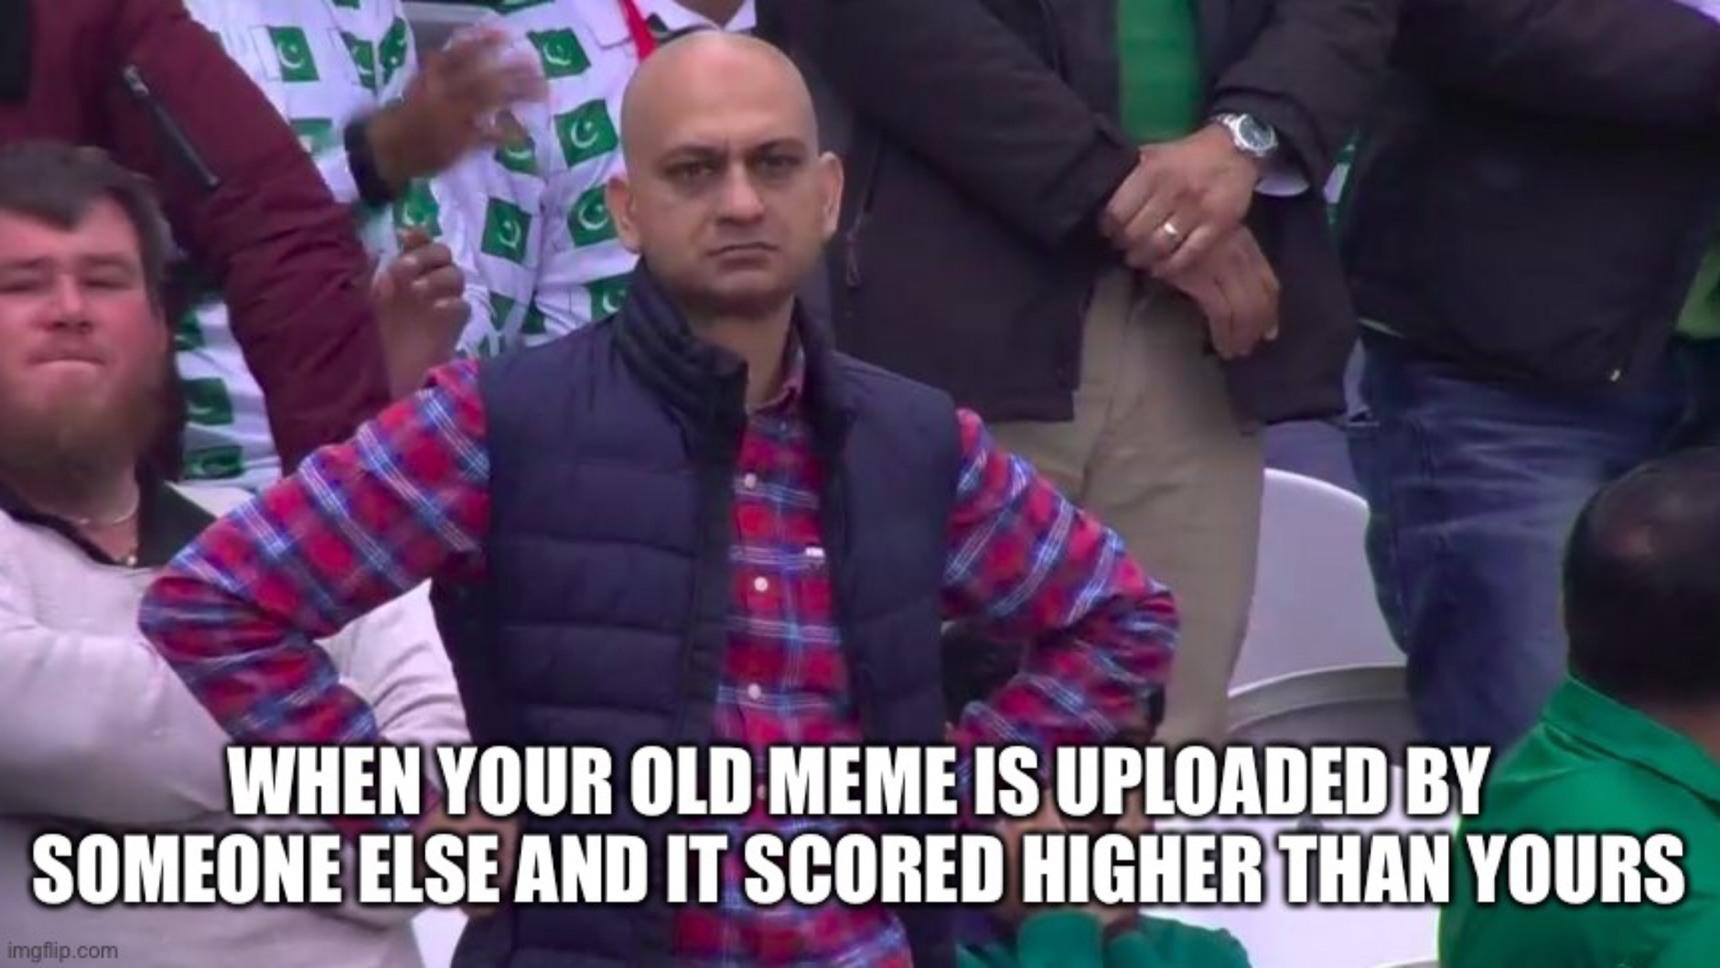 muhammad at it again - meme